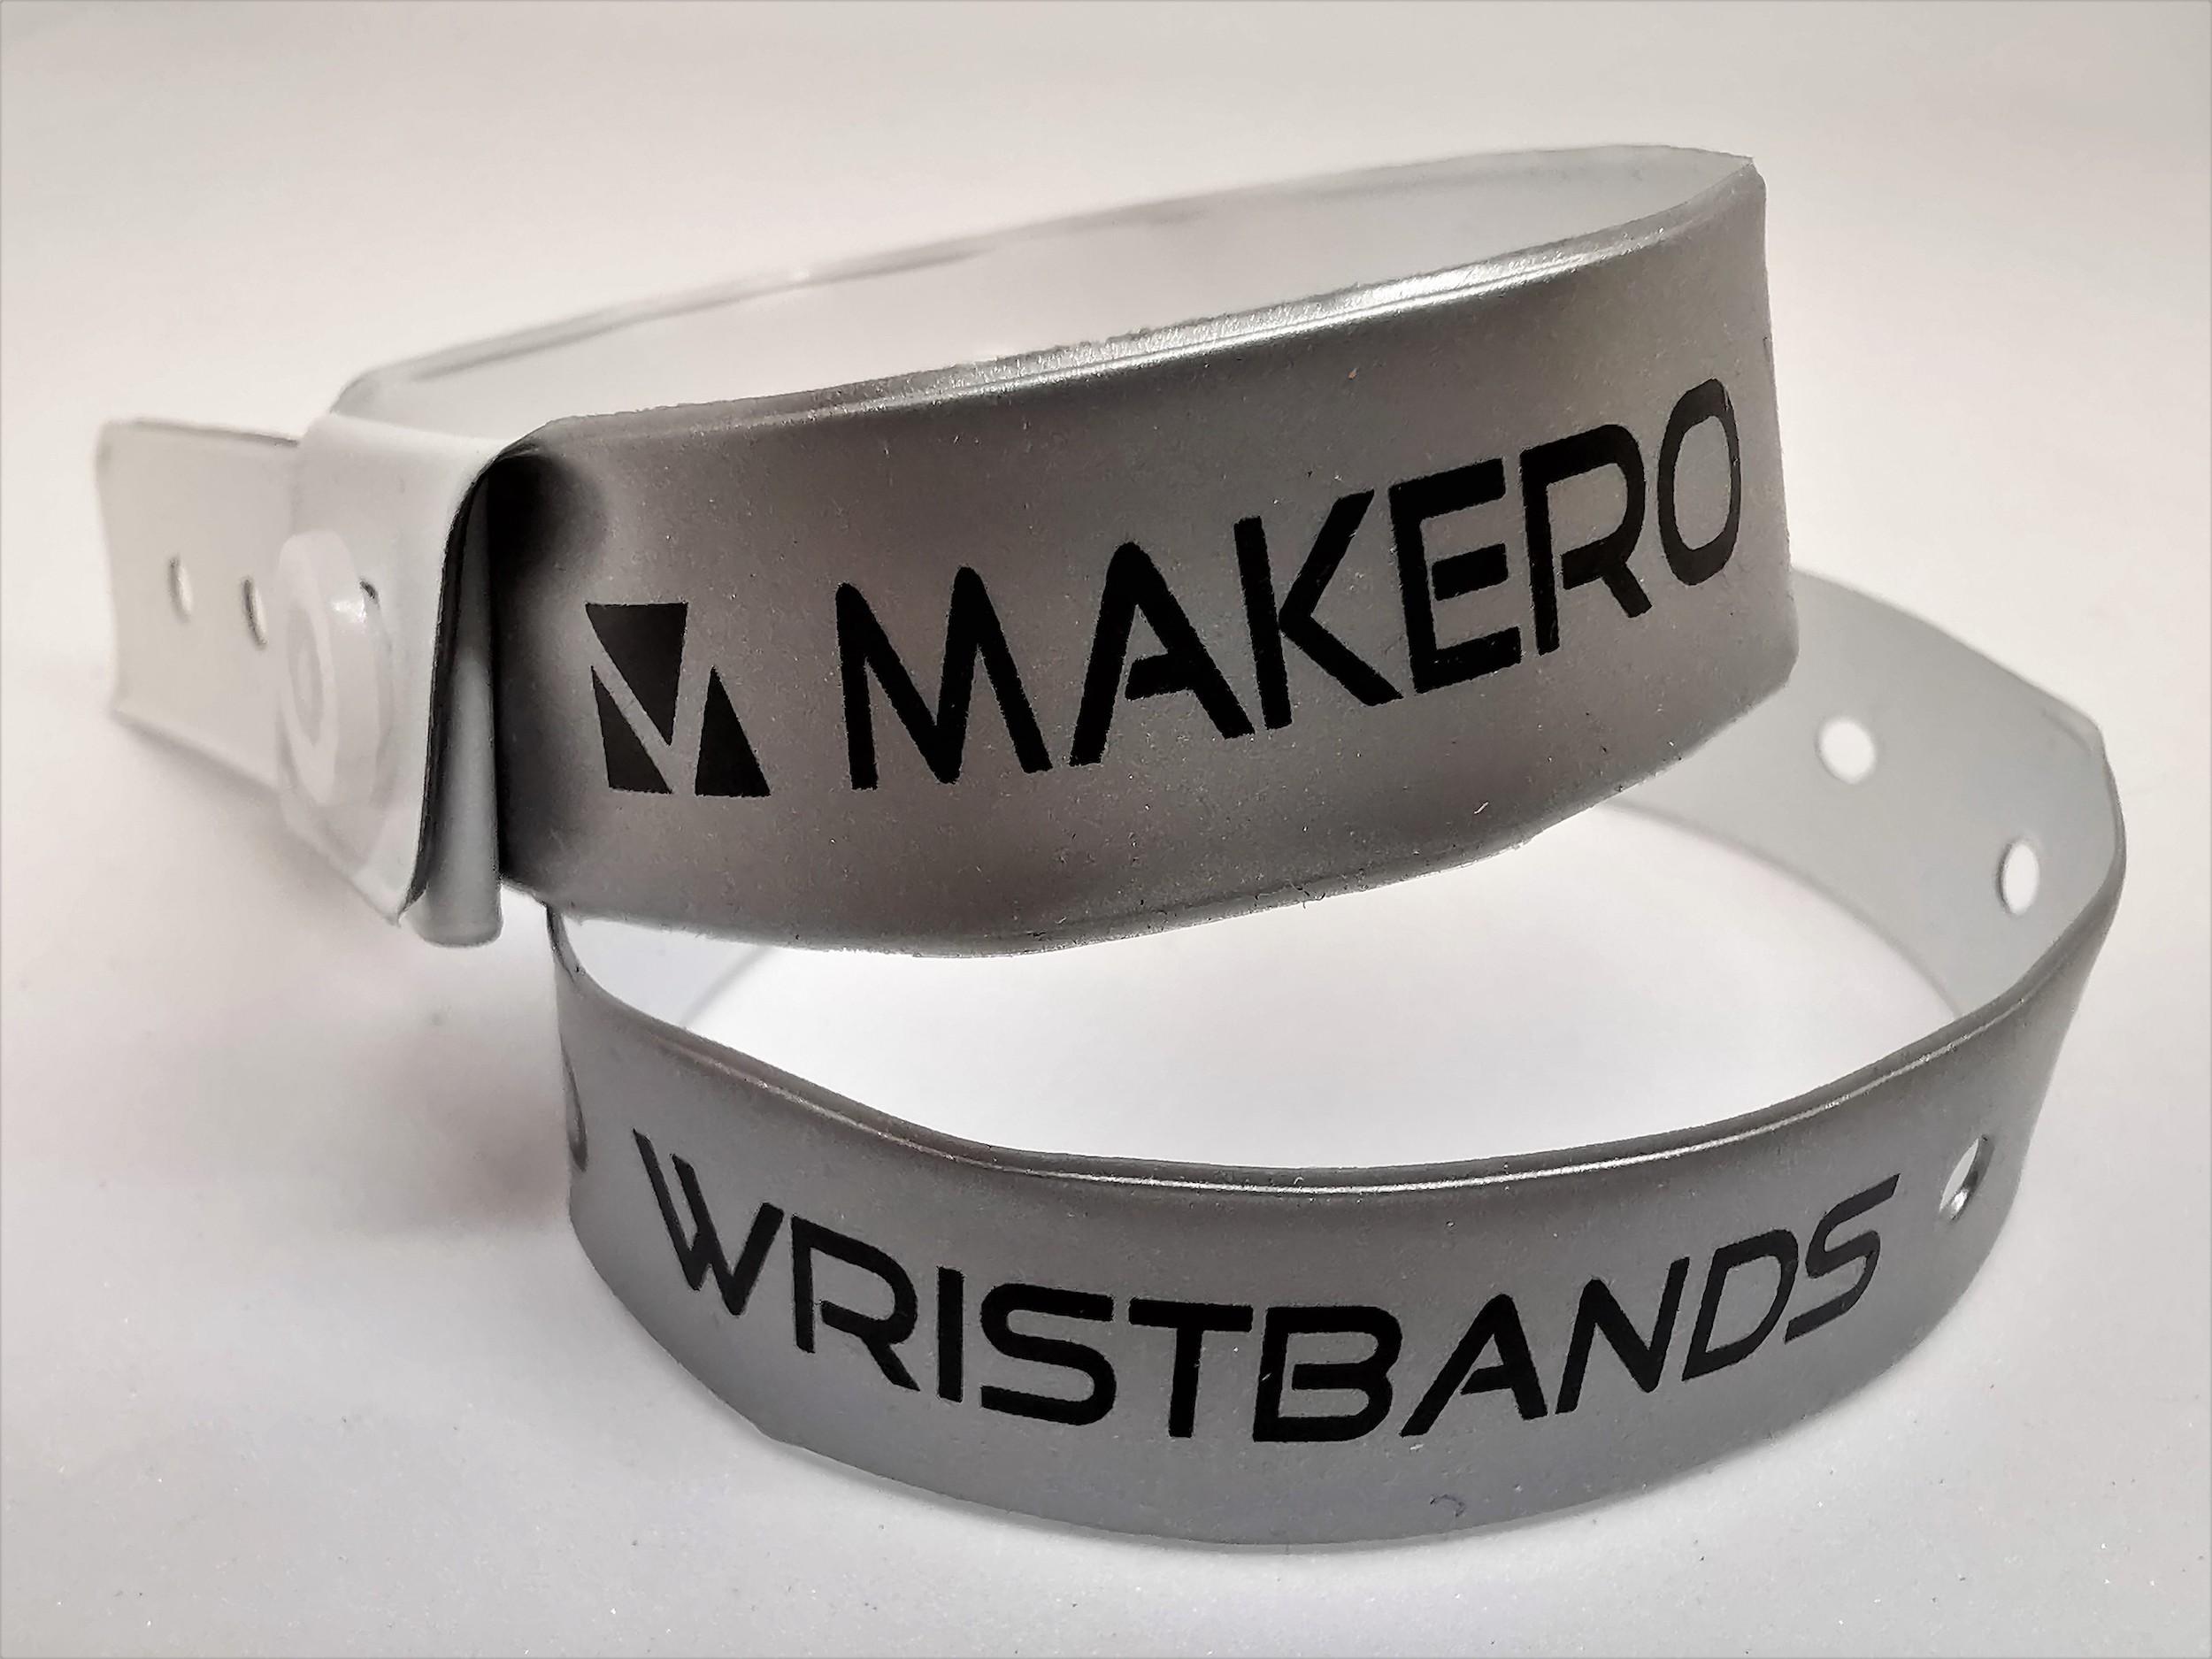 Hotel Wristband Supplier